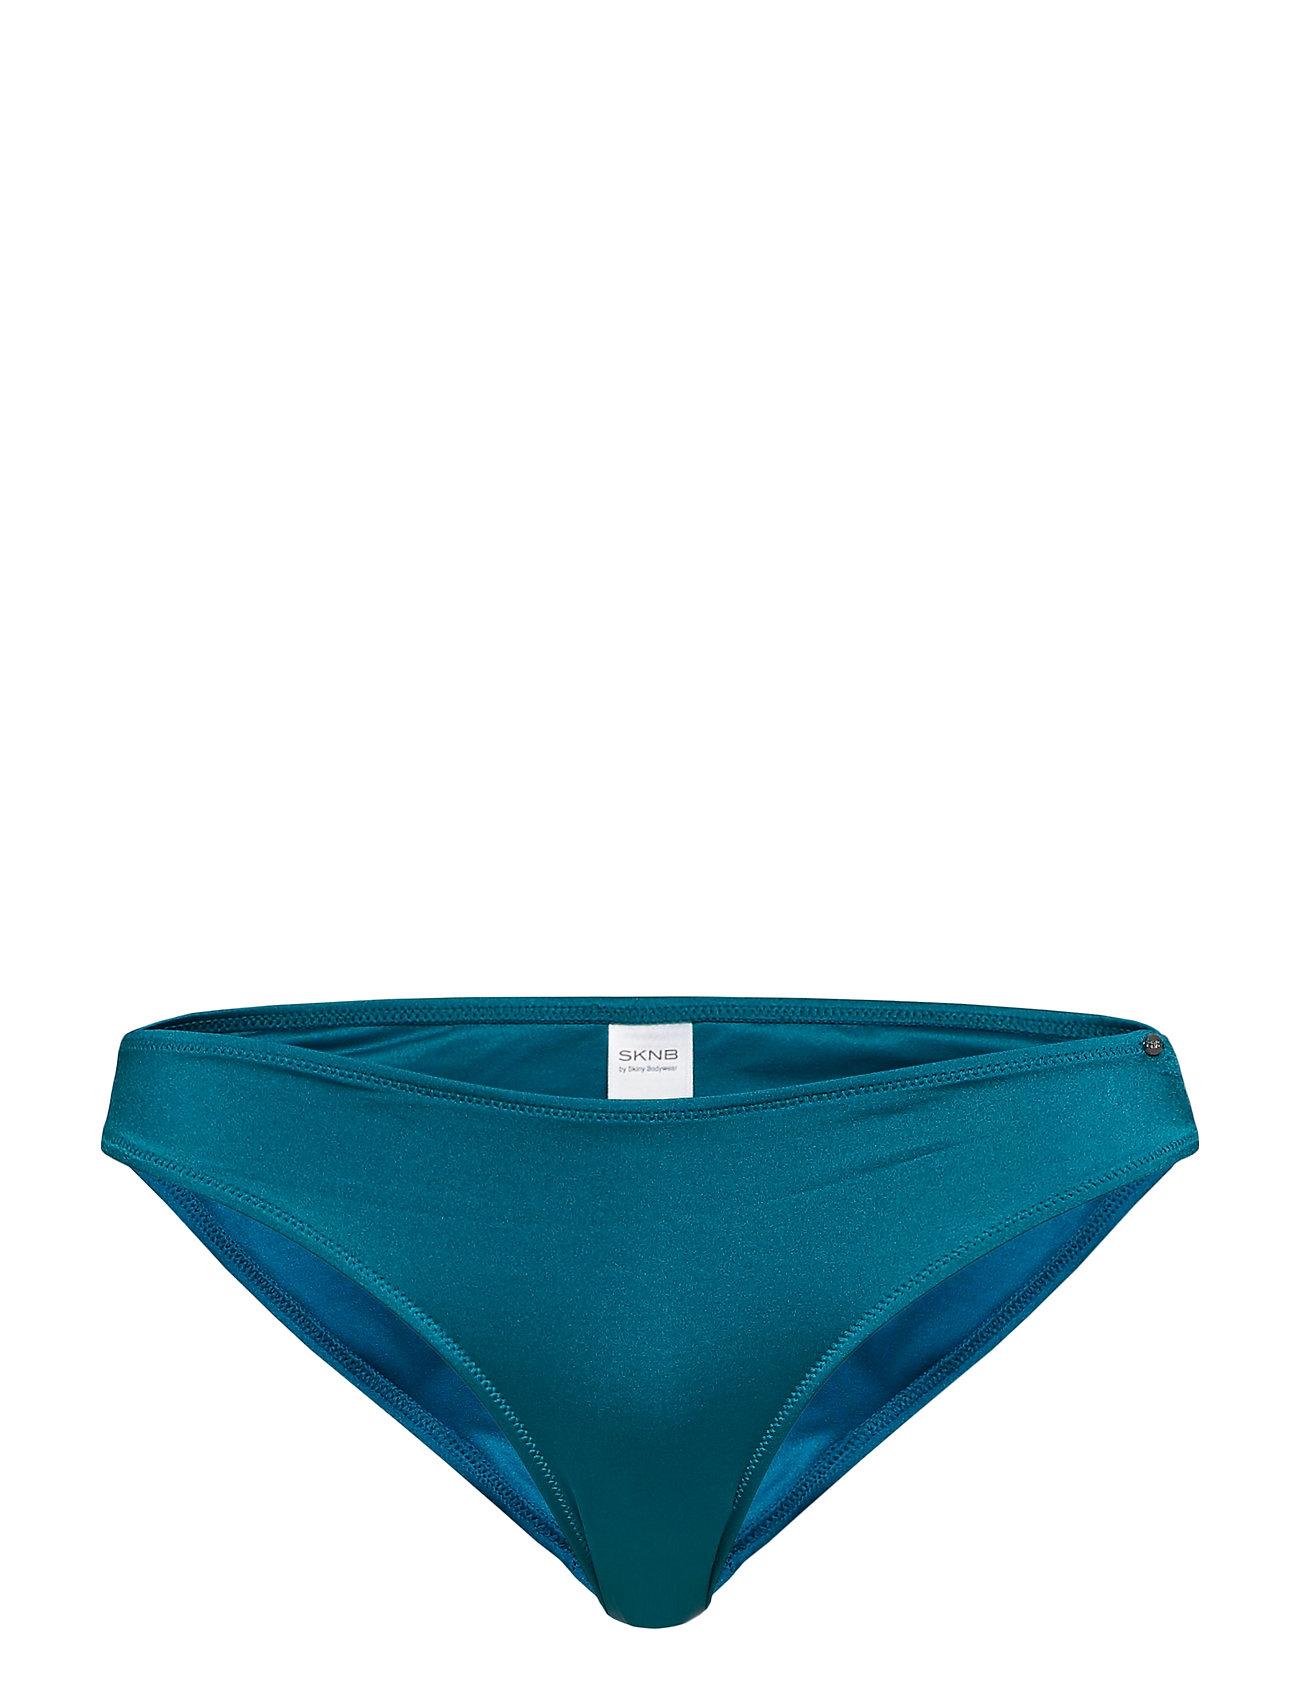 Skiny L. bikini briefs - SHINY GREEN